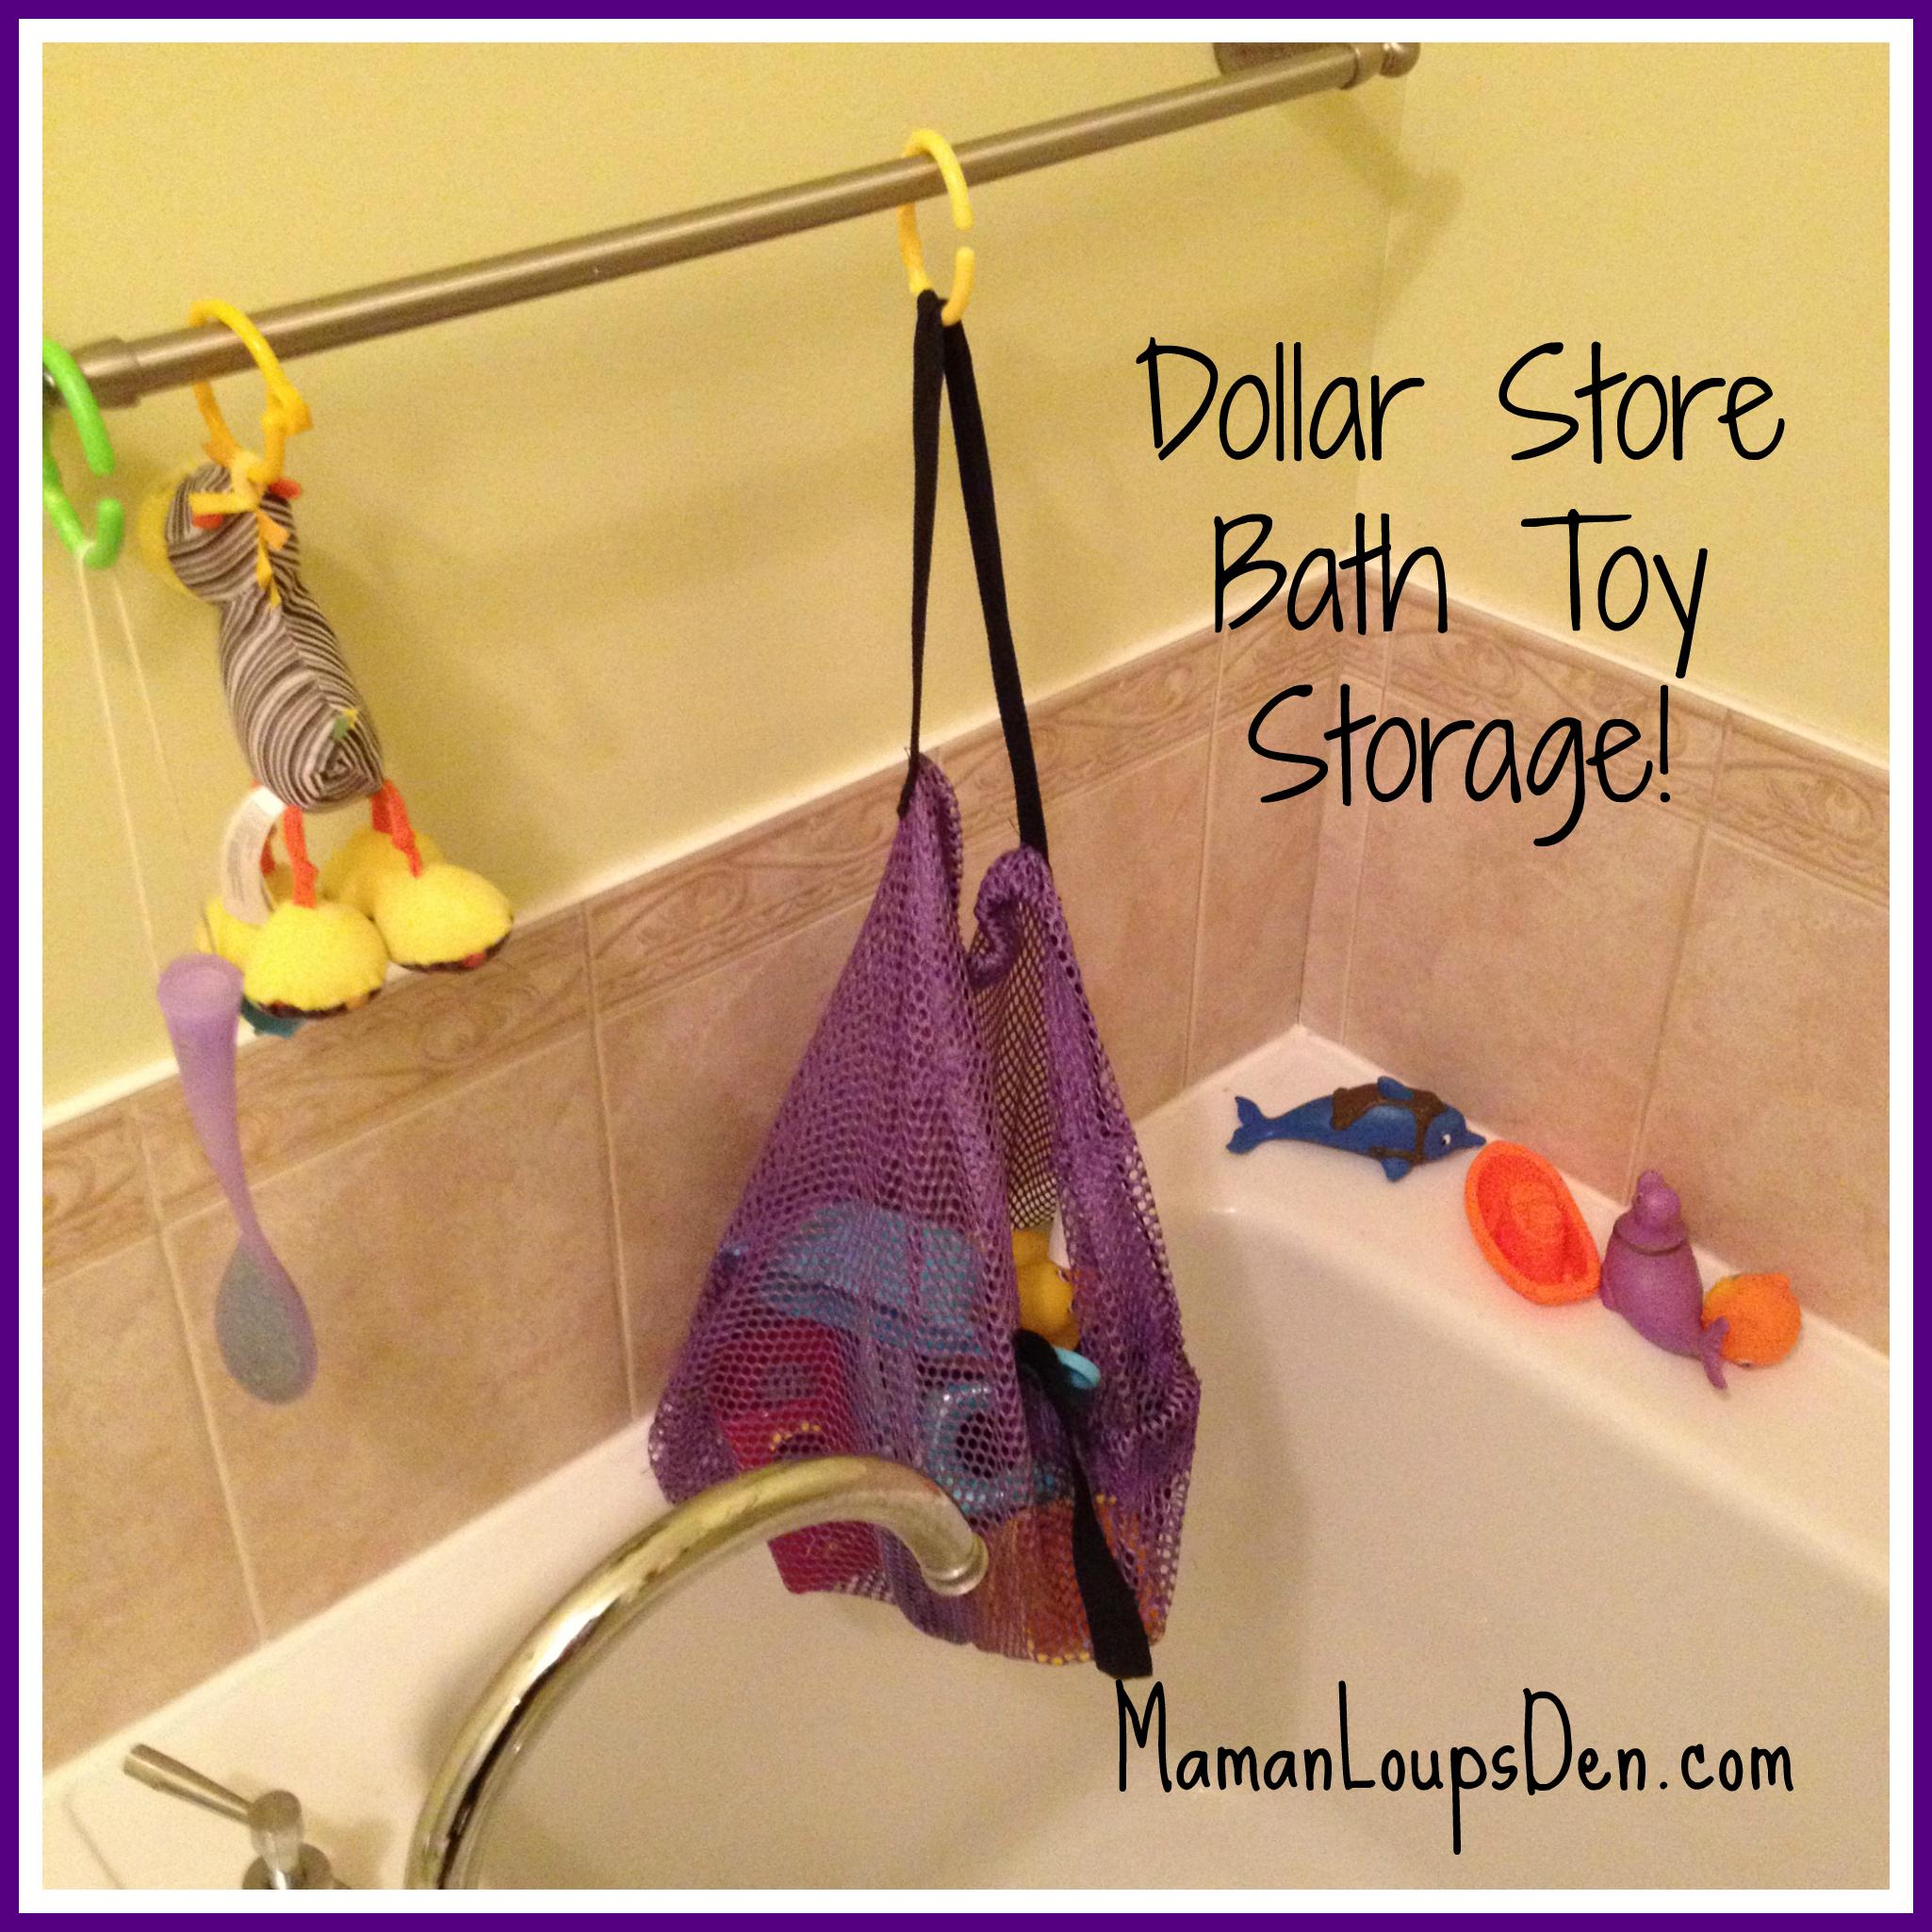 Dollarama Mesh Bag Makes Great Bath Toy Storage